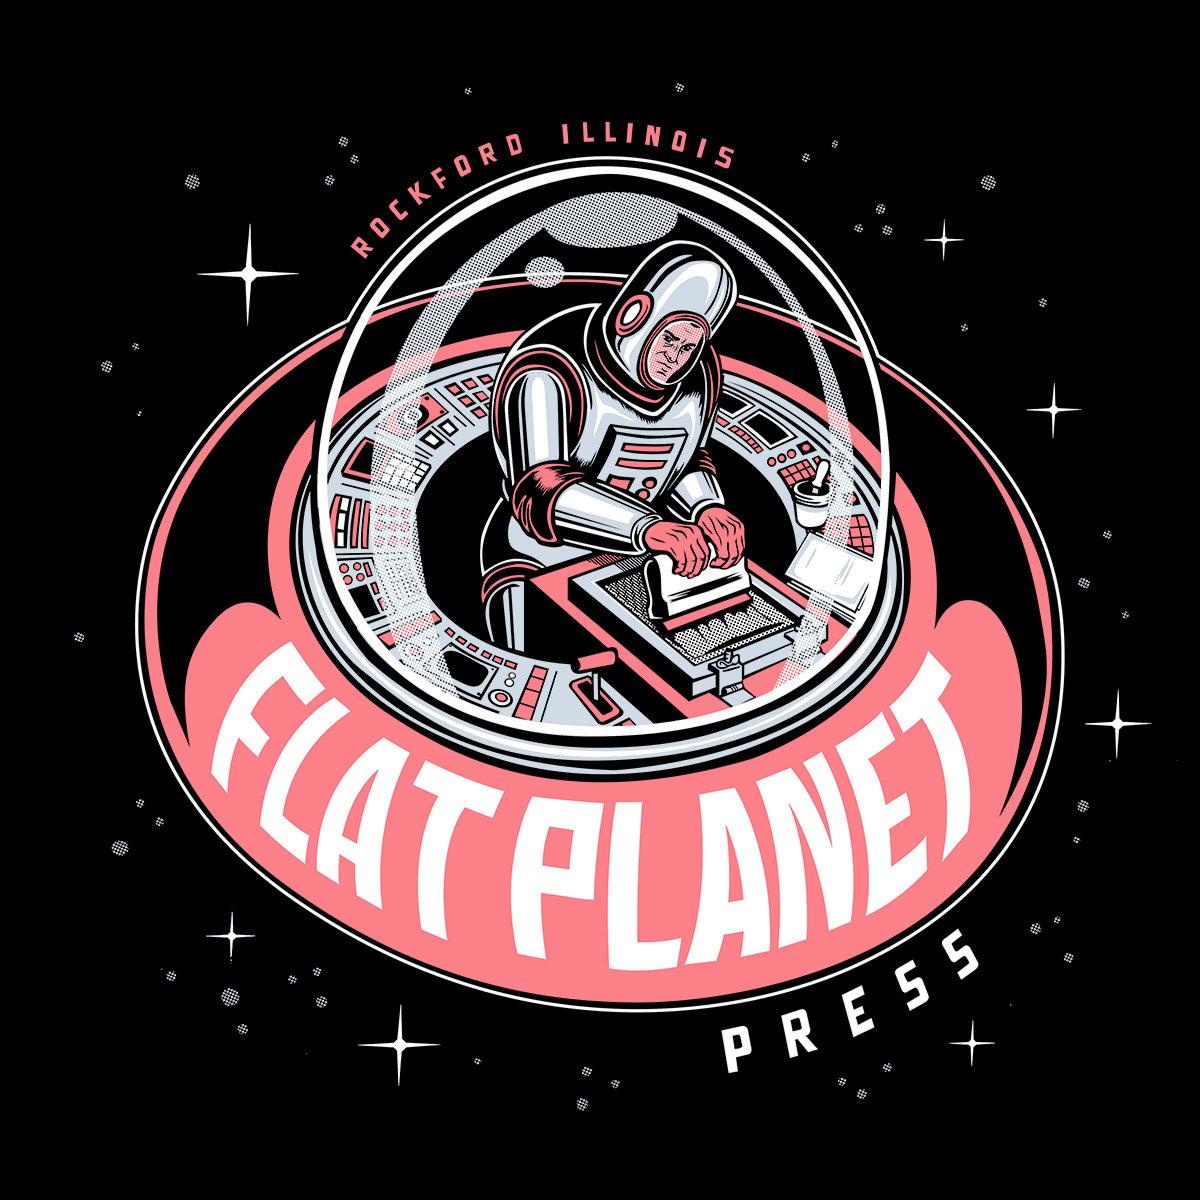 Flat Planet press Spaceman T-shirt (IN STOCK!)